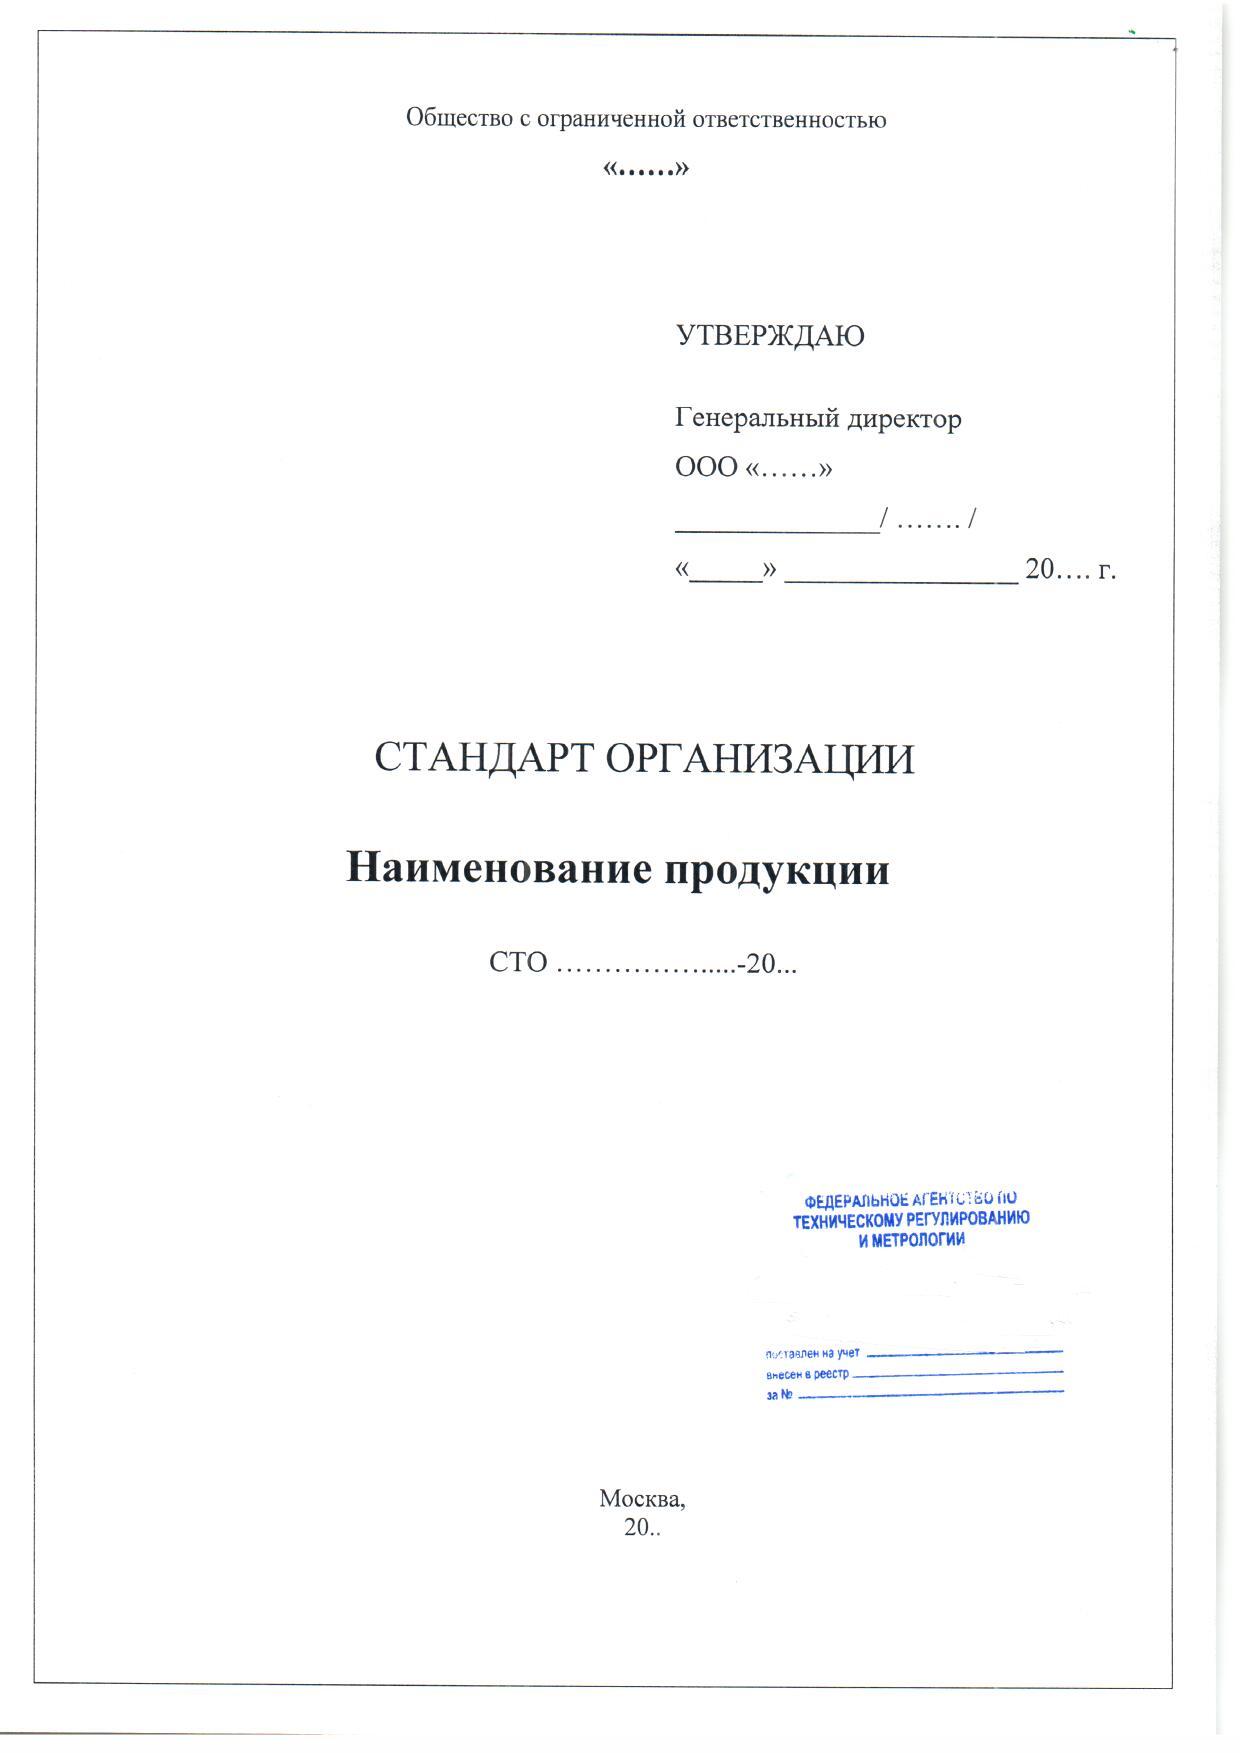 Экспертиза стандарта организации (СТО)